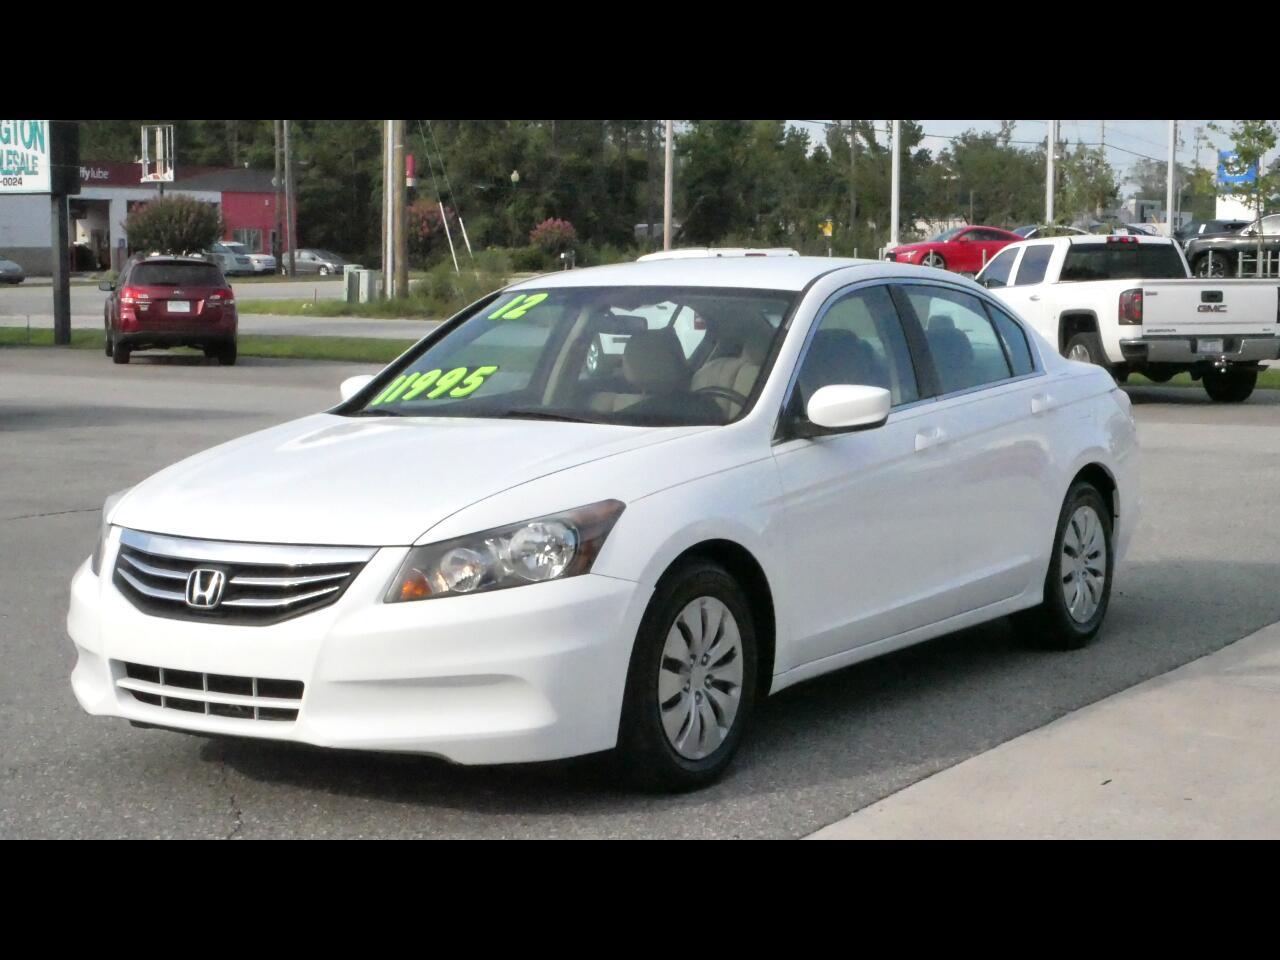 Honda Accord Sdn 4dr I4 Auto LX 2012